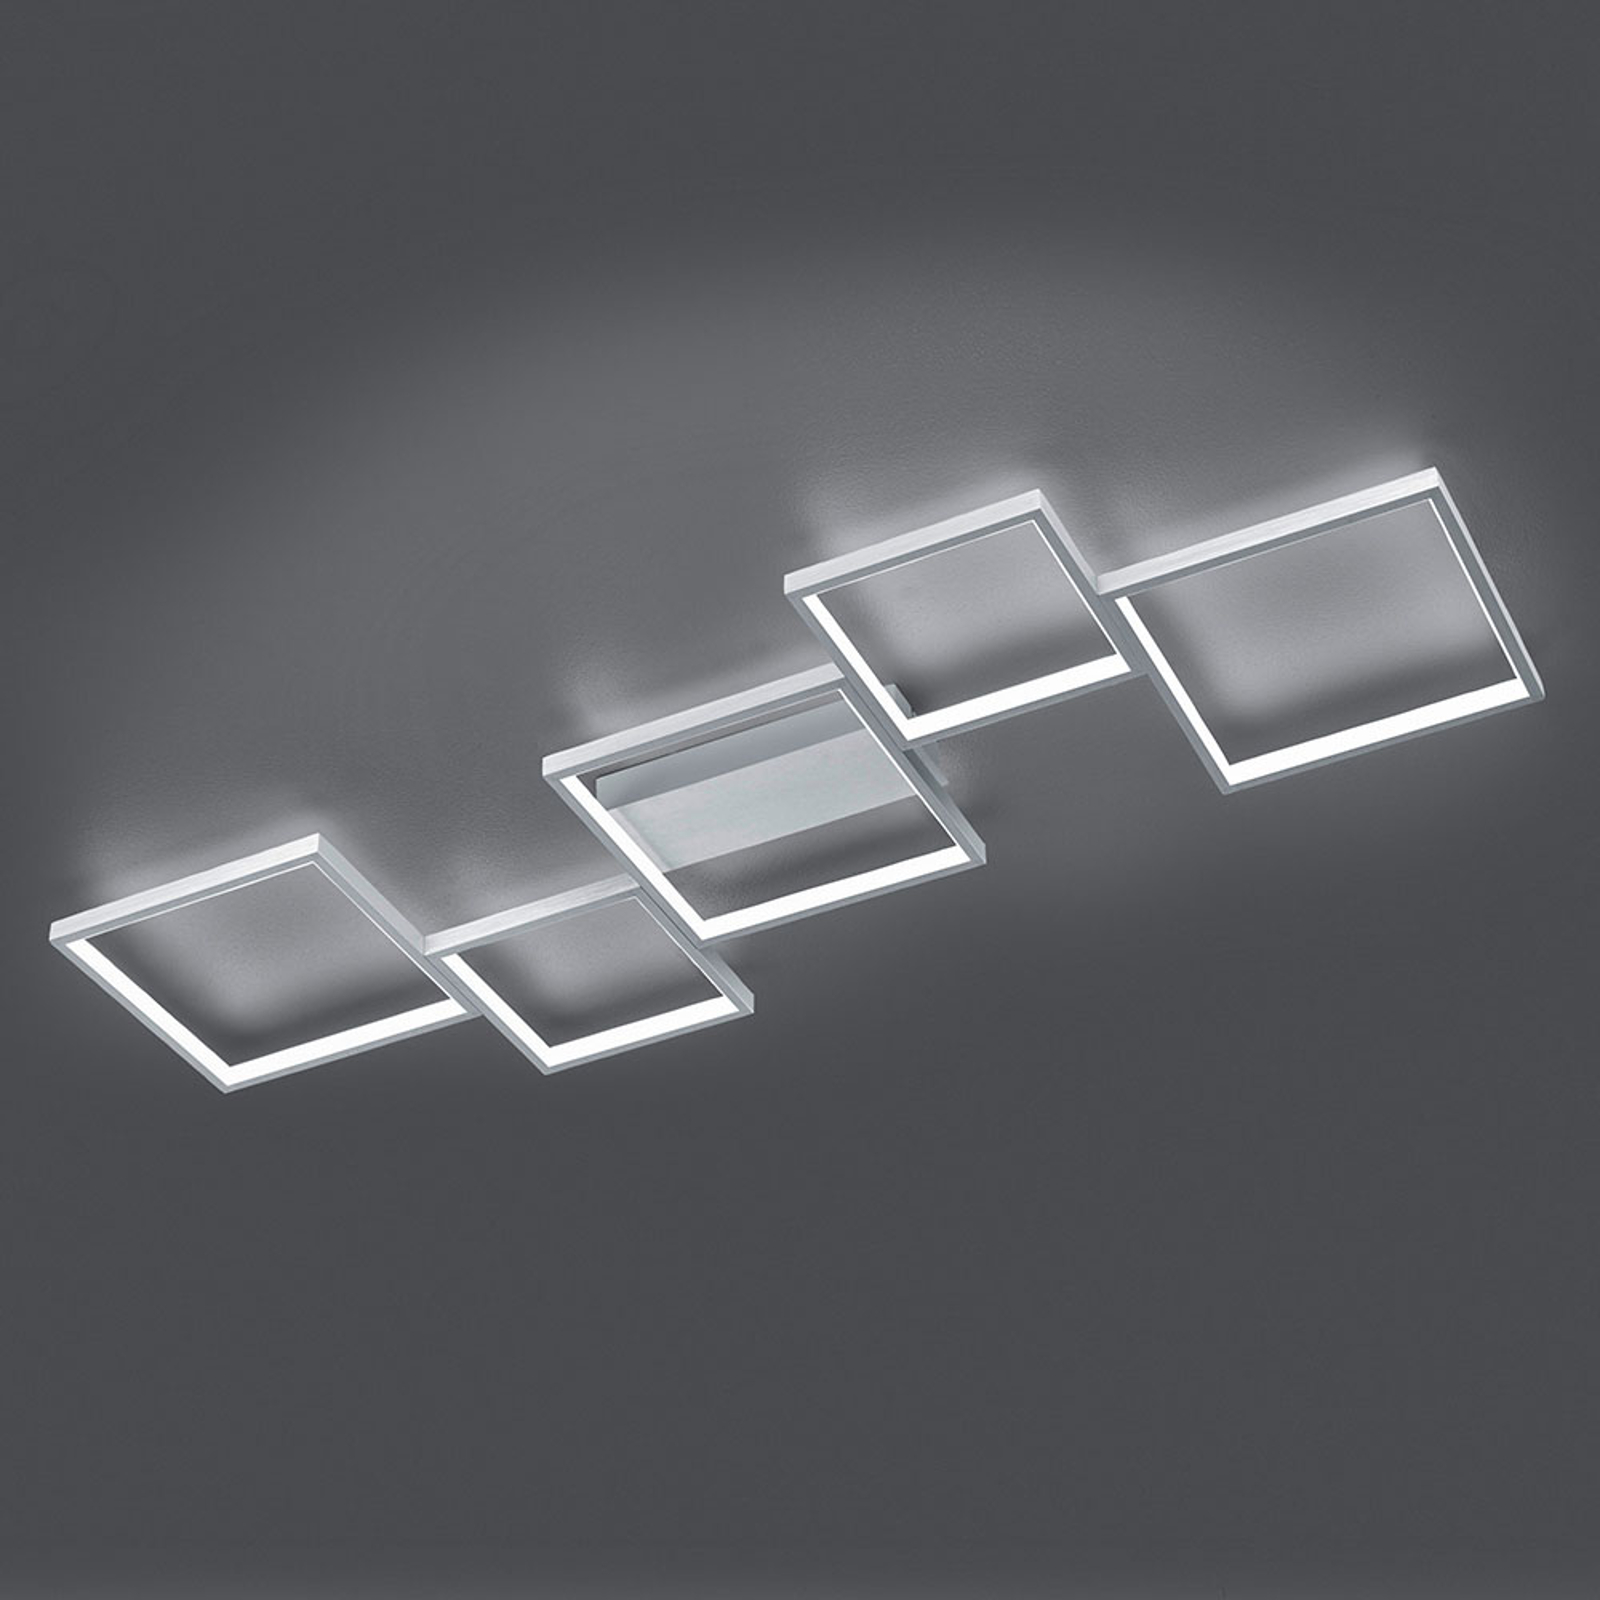 LED-Deckenleuchte Sorrento 120x48cm, alu gebürstet